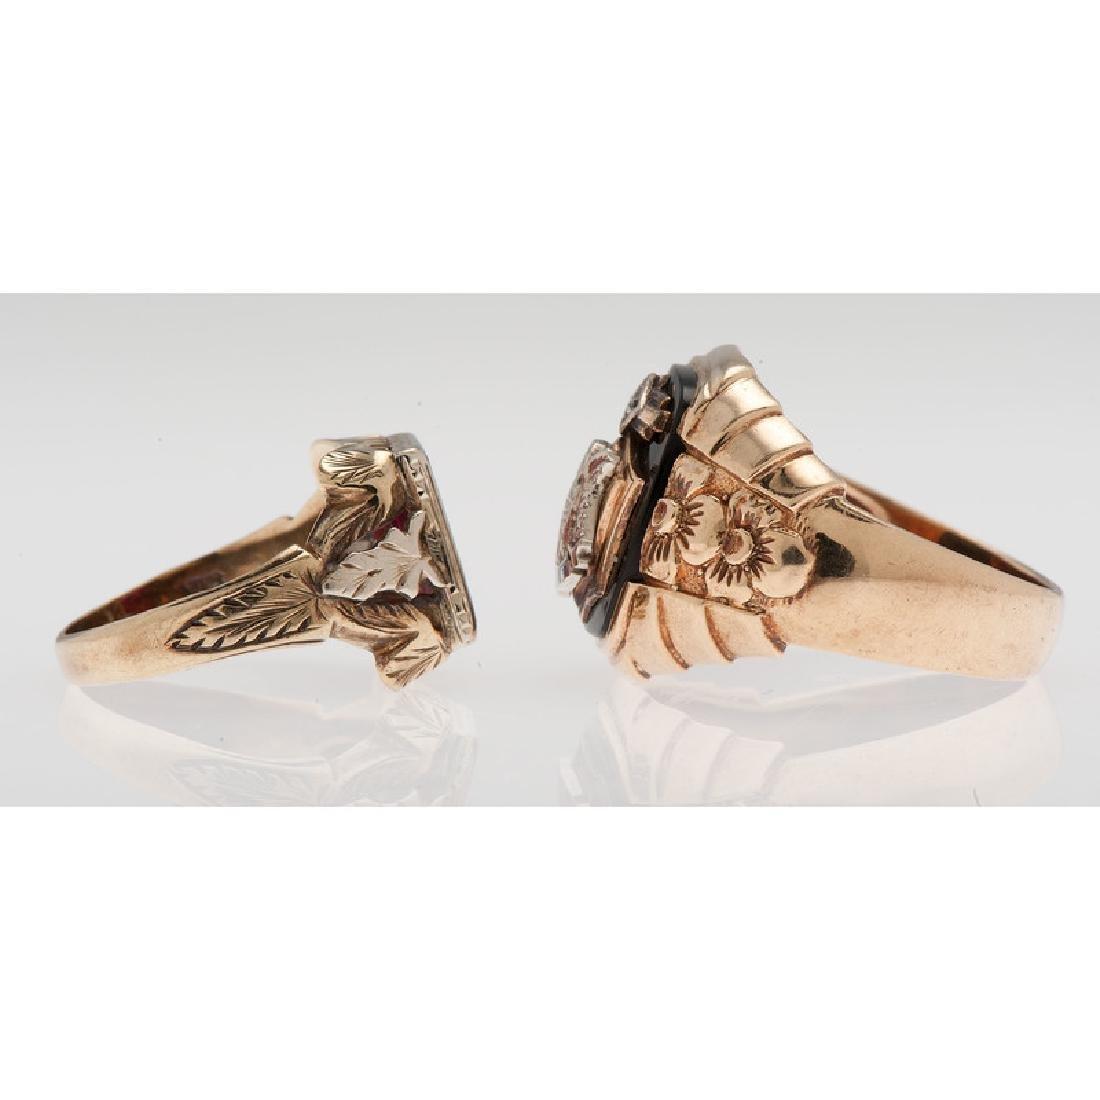 10 Karat Gold Fraternal Jewelry - 2